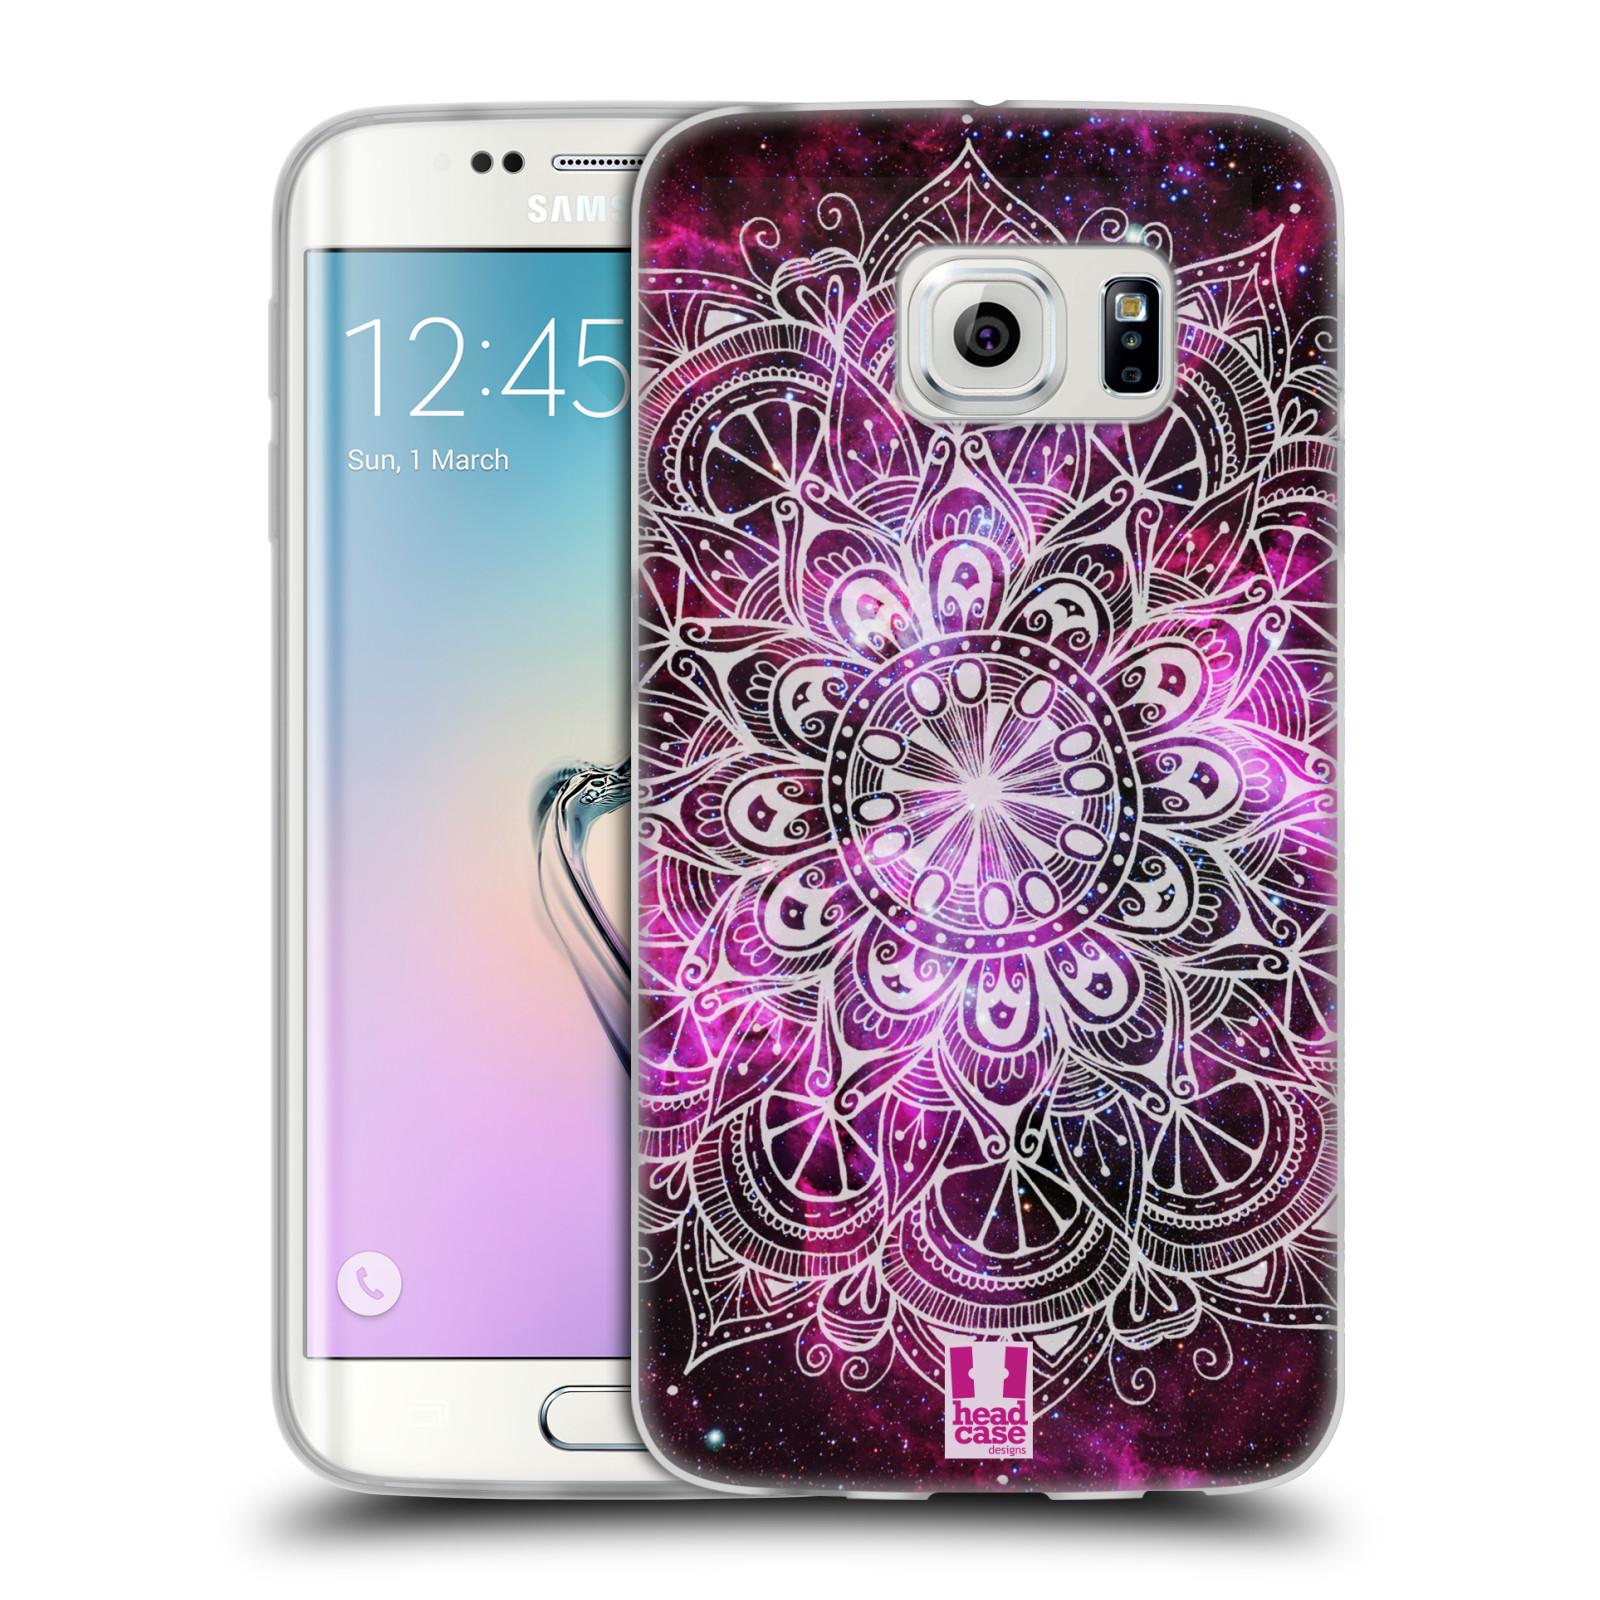 Silikonové pouzdro na mobil Samsung Galaxy S6 Edge HEAD CASE Mandala Doodle Nebula (Silikonový kryt či obal na mobilní telefon Samsung Galaxy S6 Edge SM-G925F)